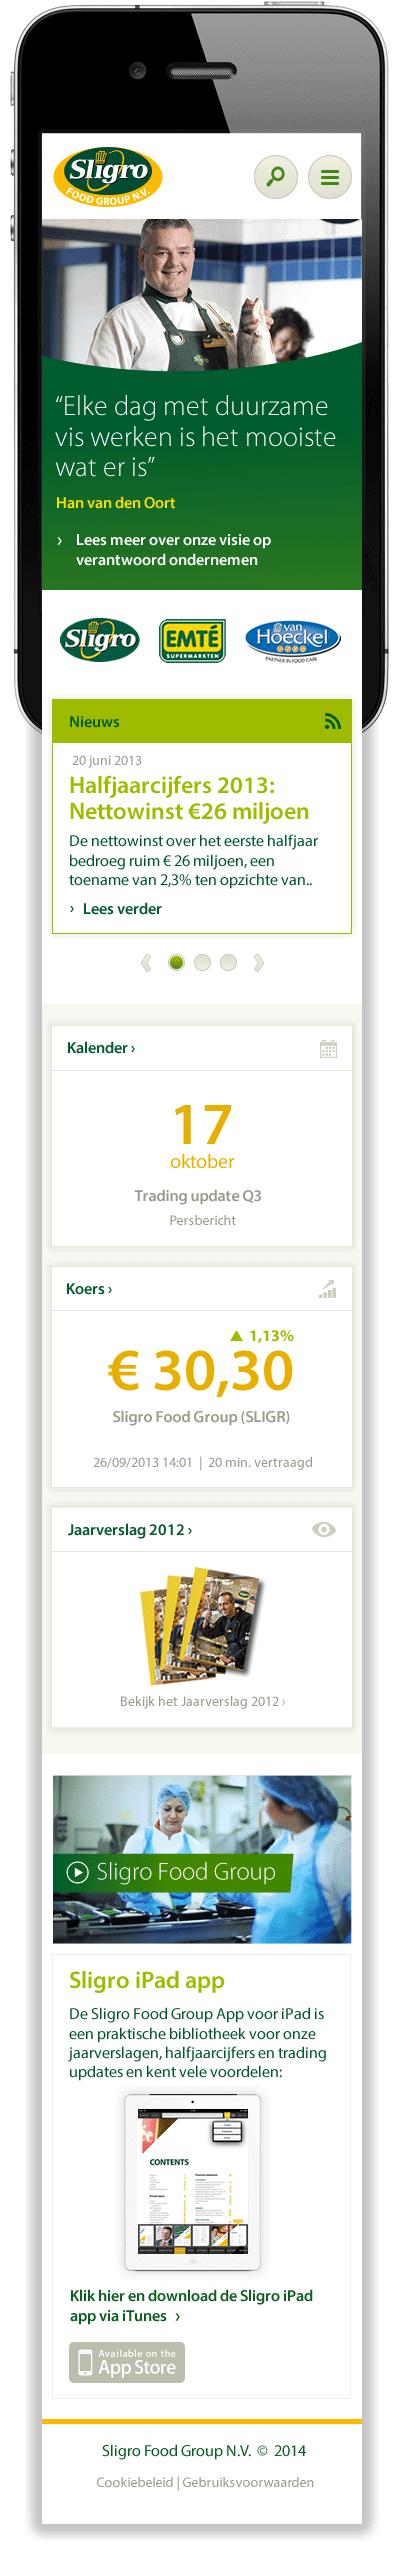 Sligro_statisch_1